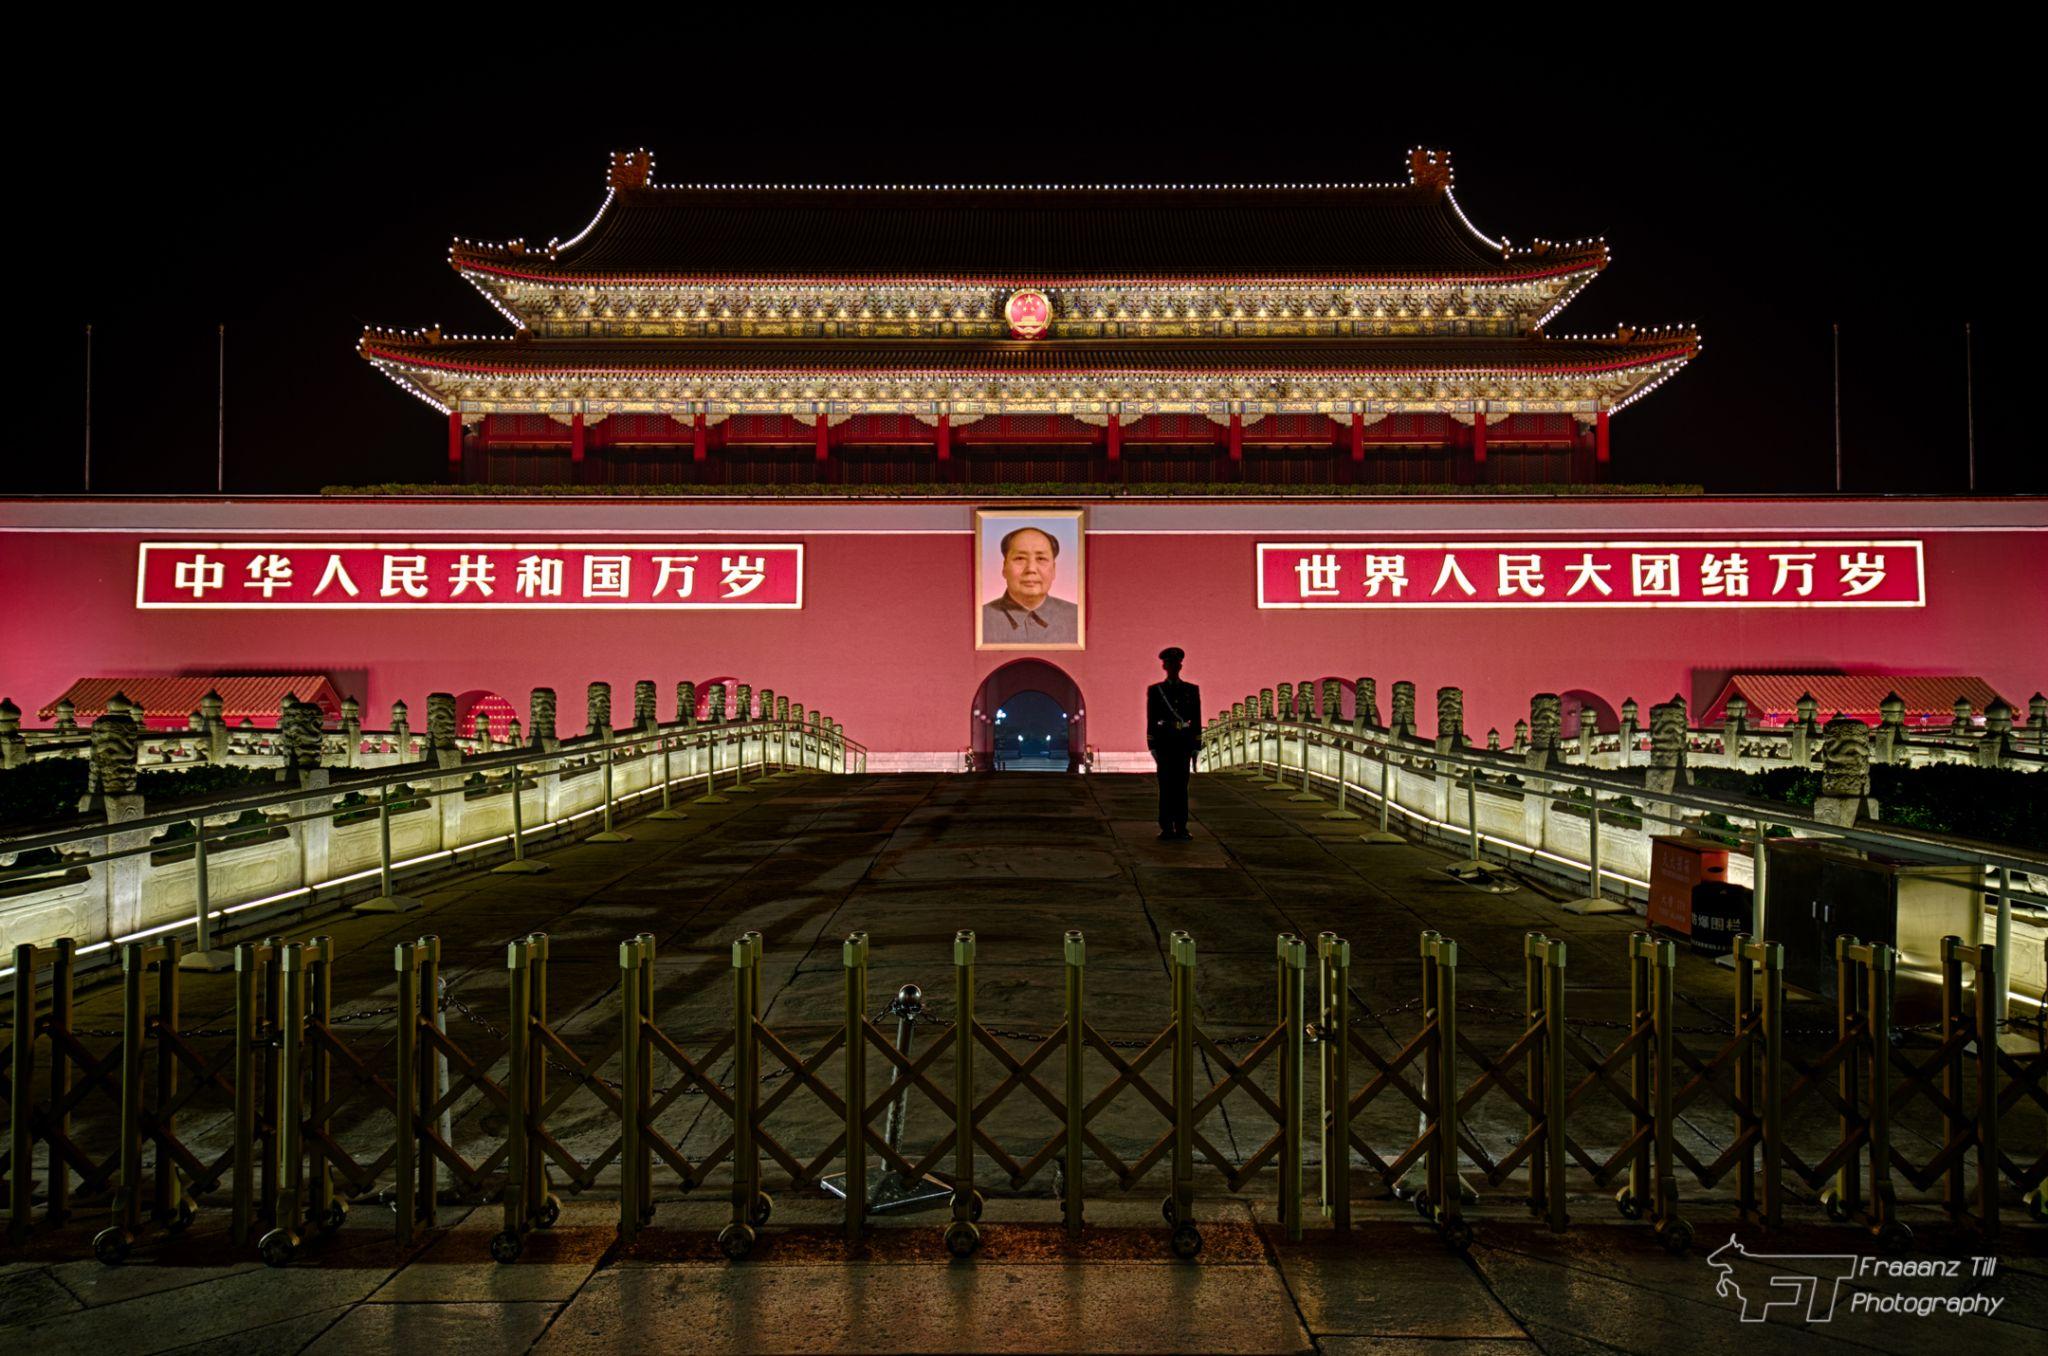 Tiananmen, China